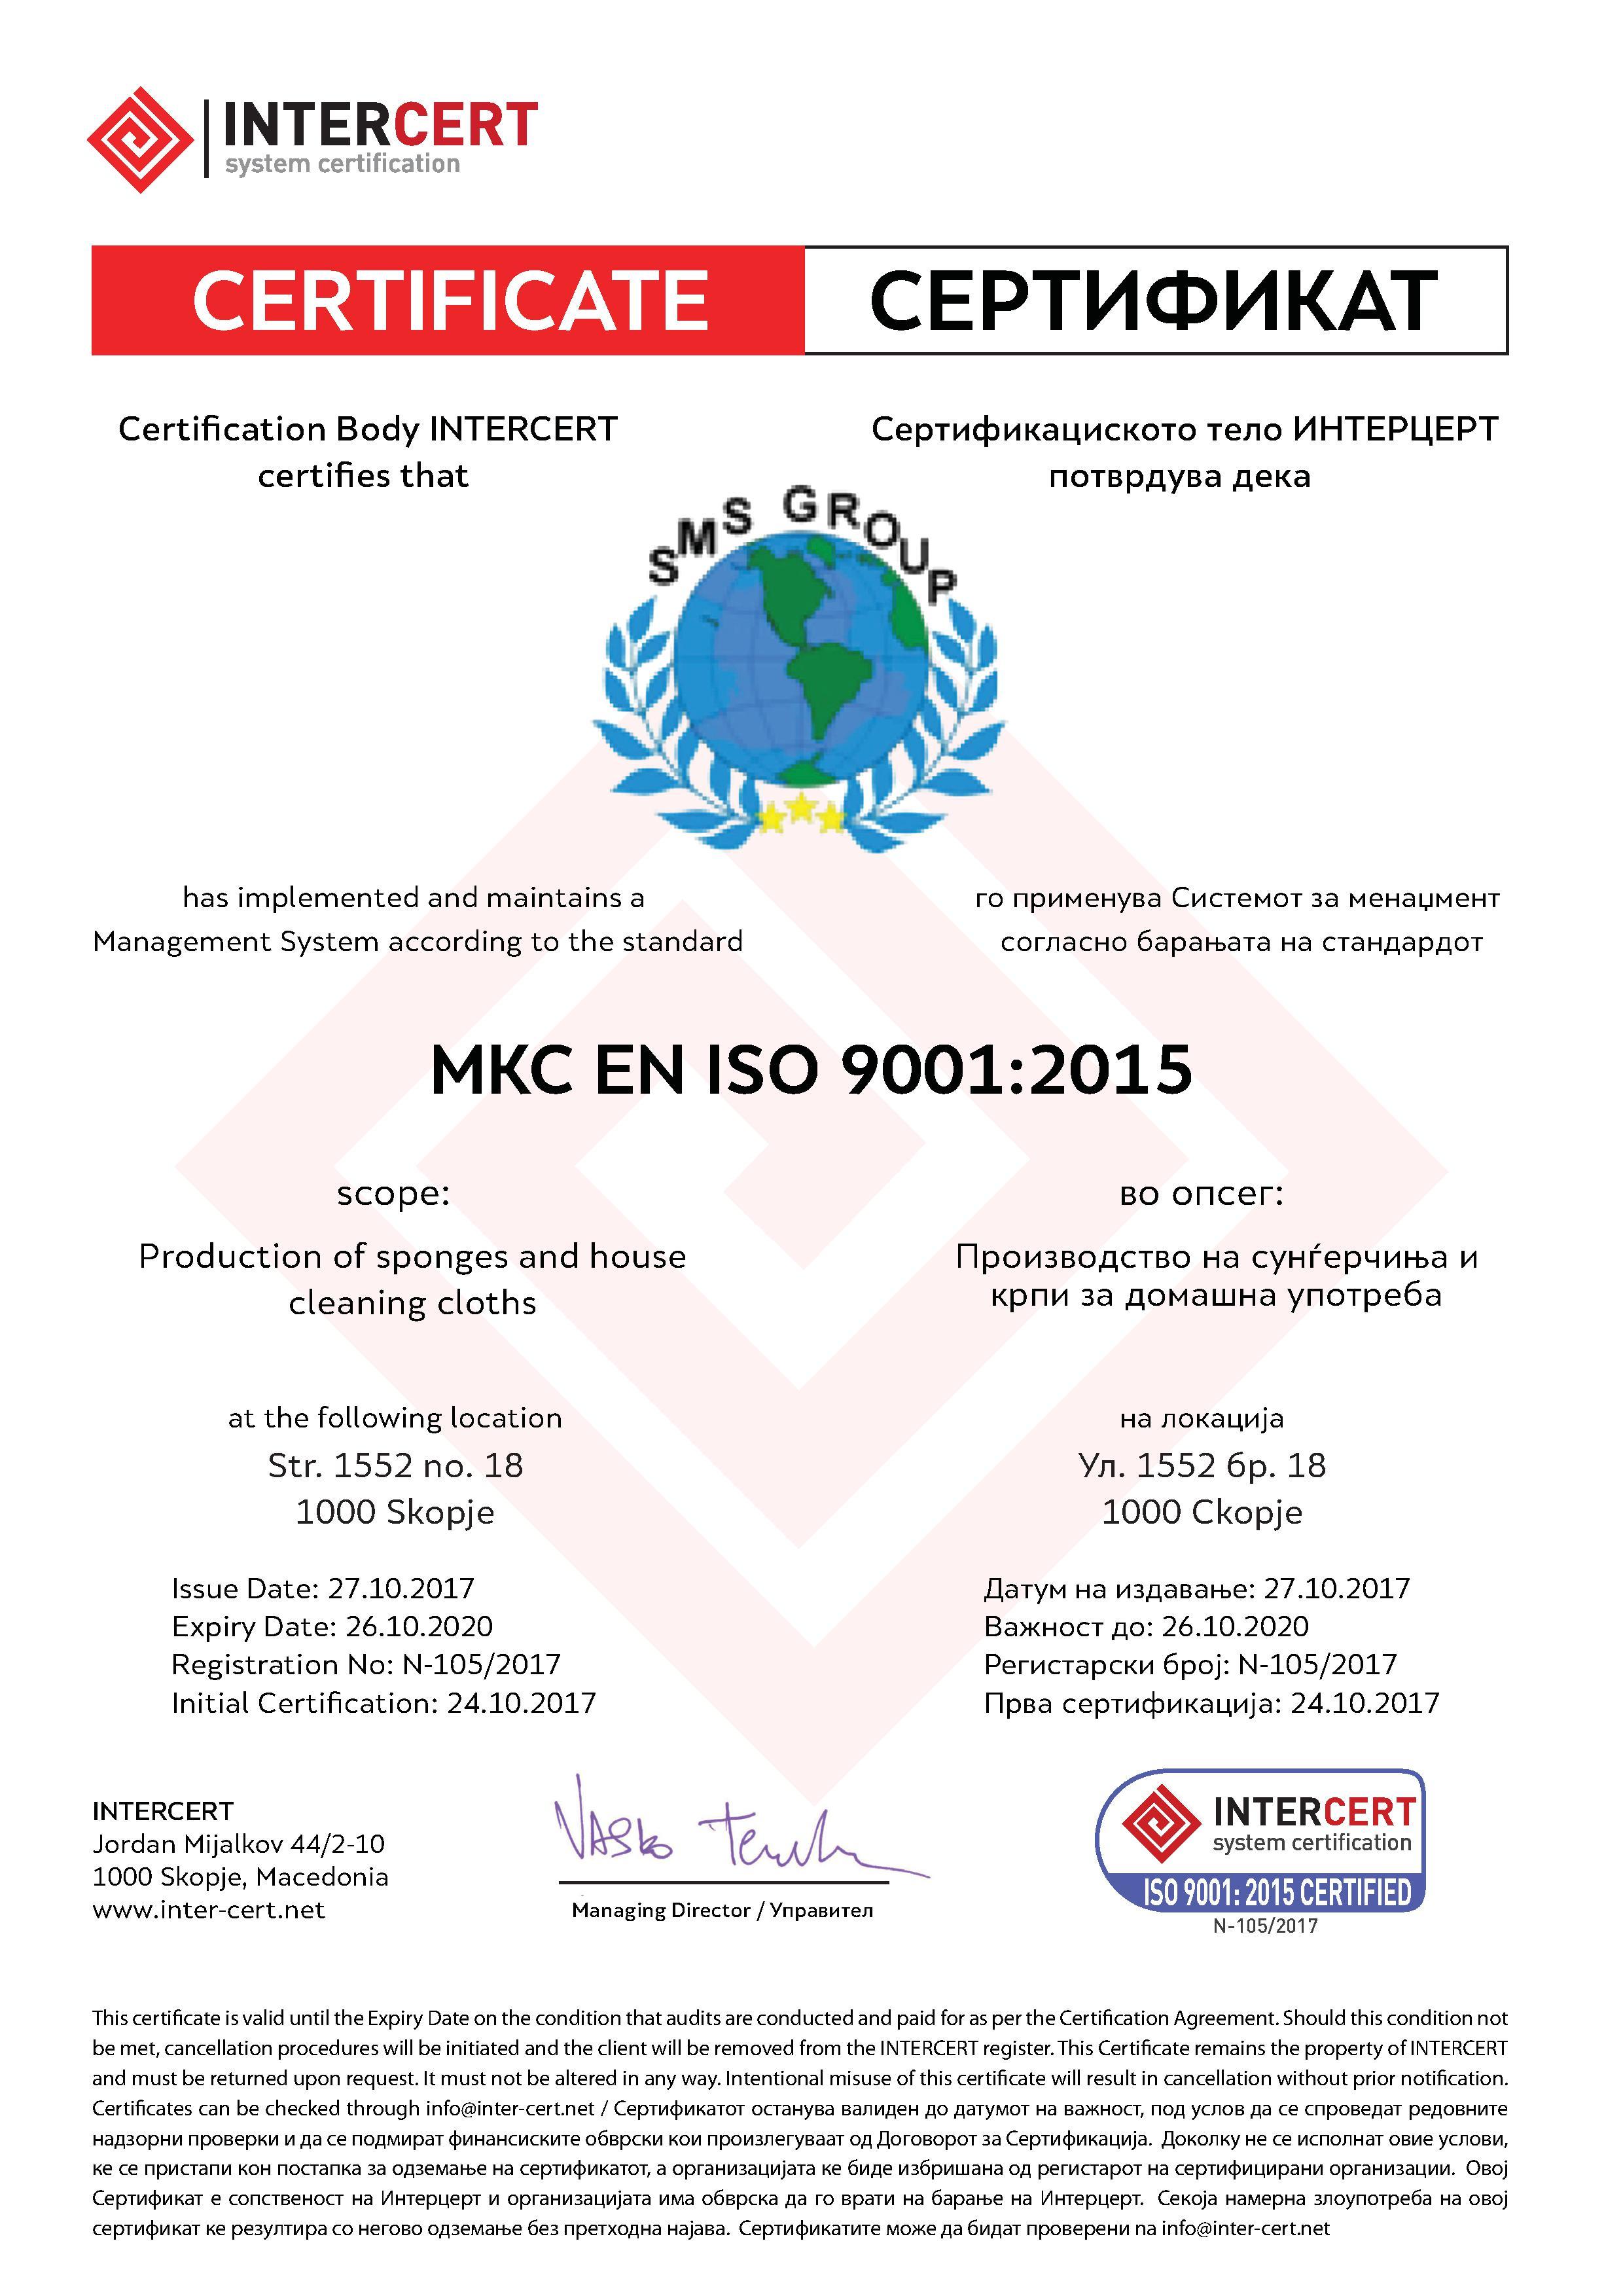 Сертификат_105_СМС Гроуп